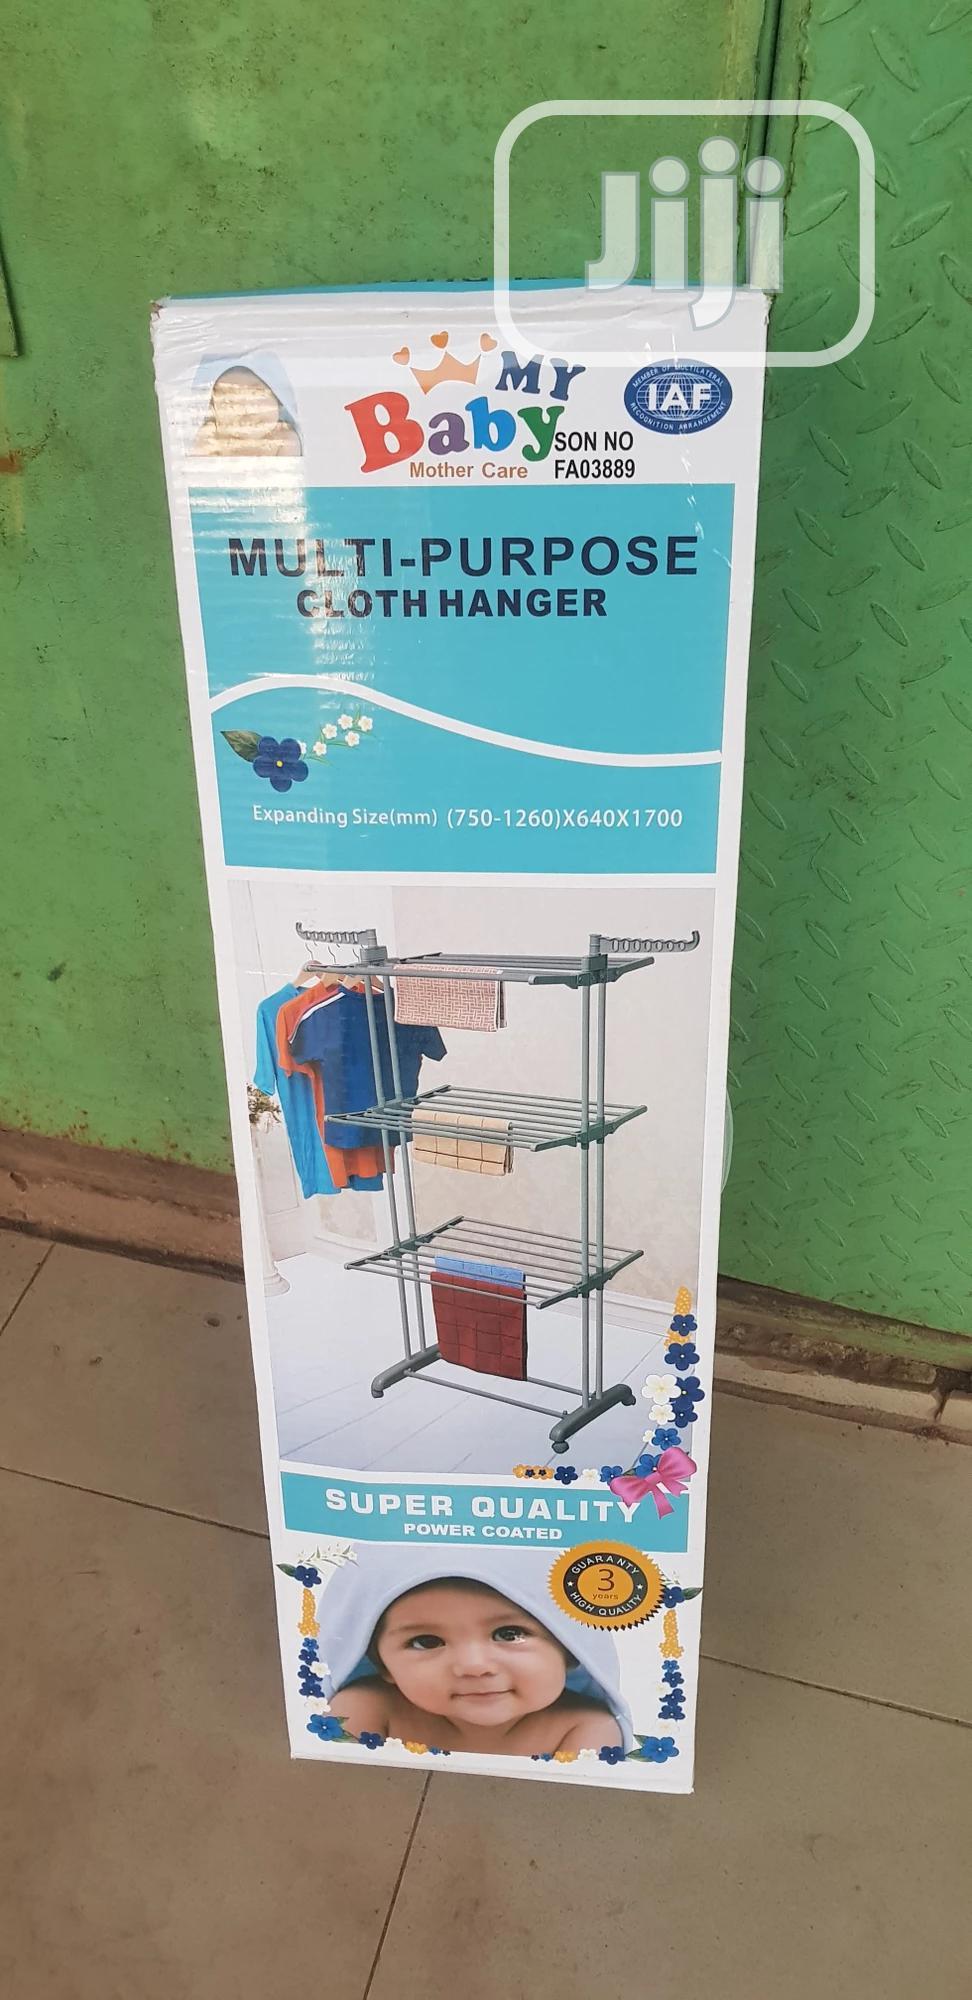 My Baby Hanger | Children's Furniture for sale in Benin City, Edo State, Nigeria